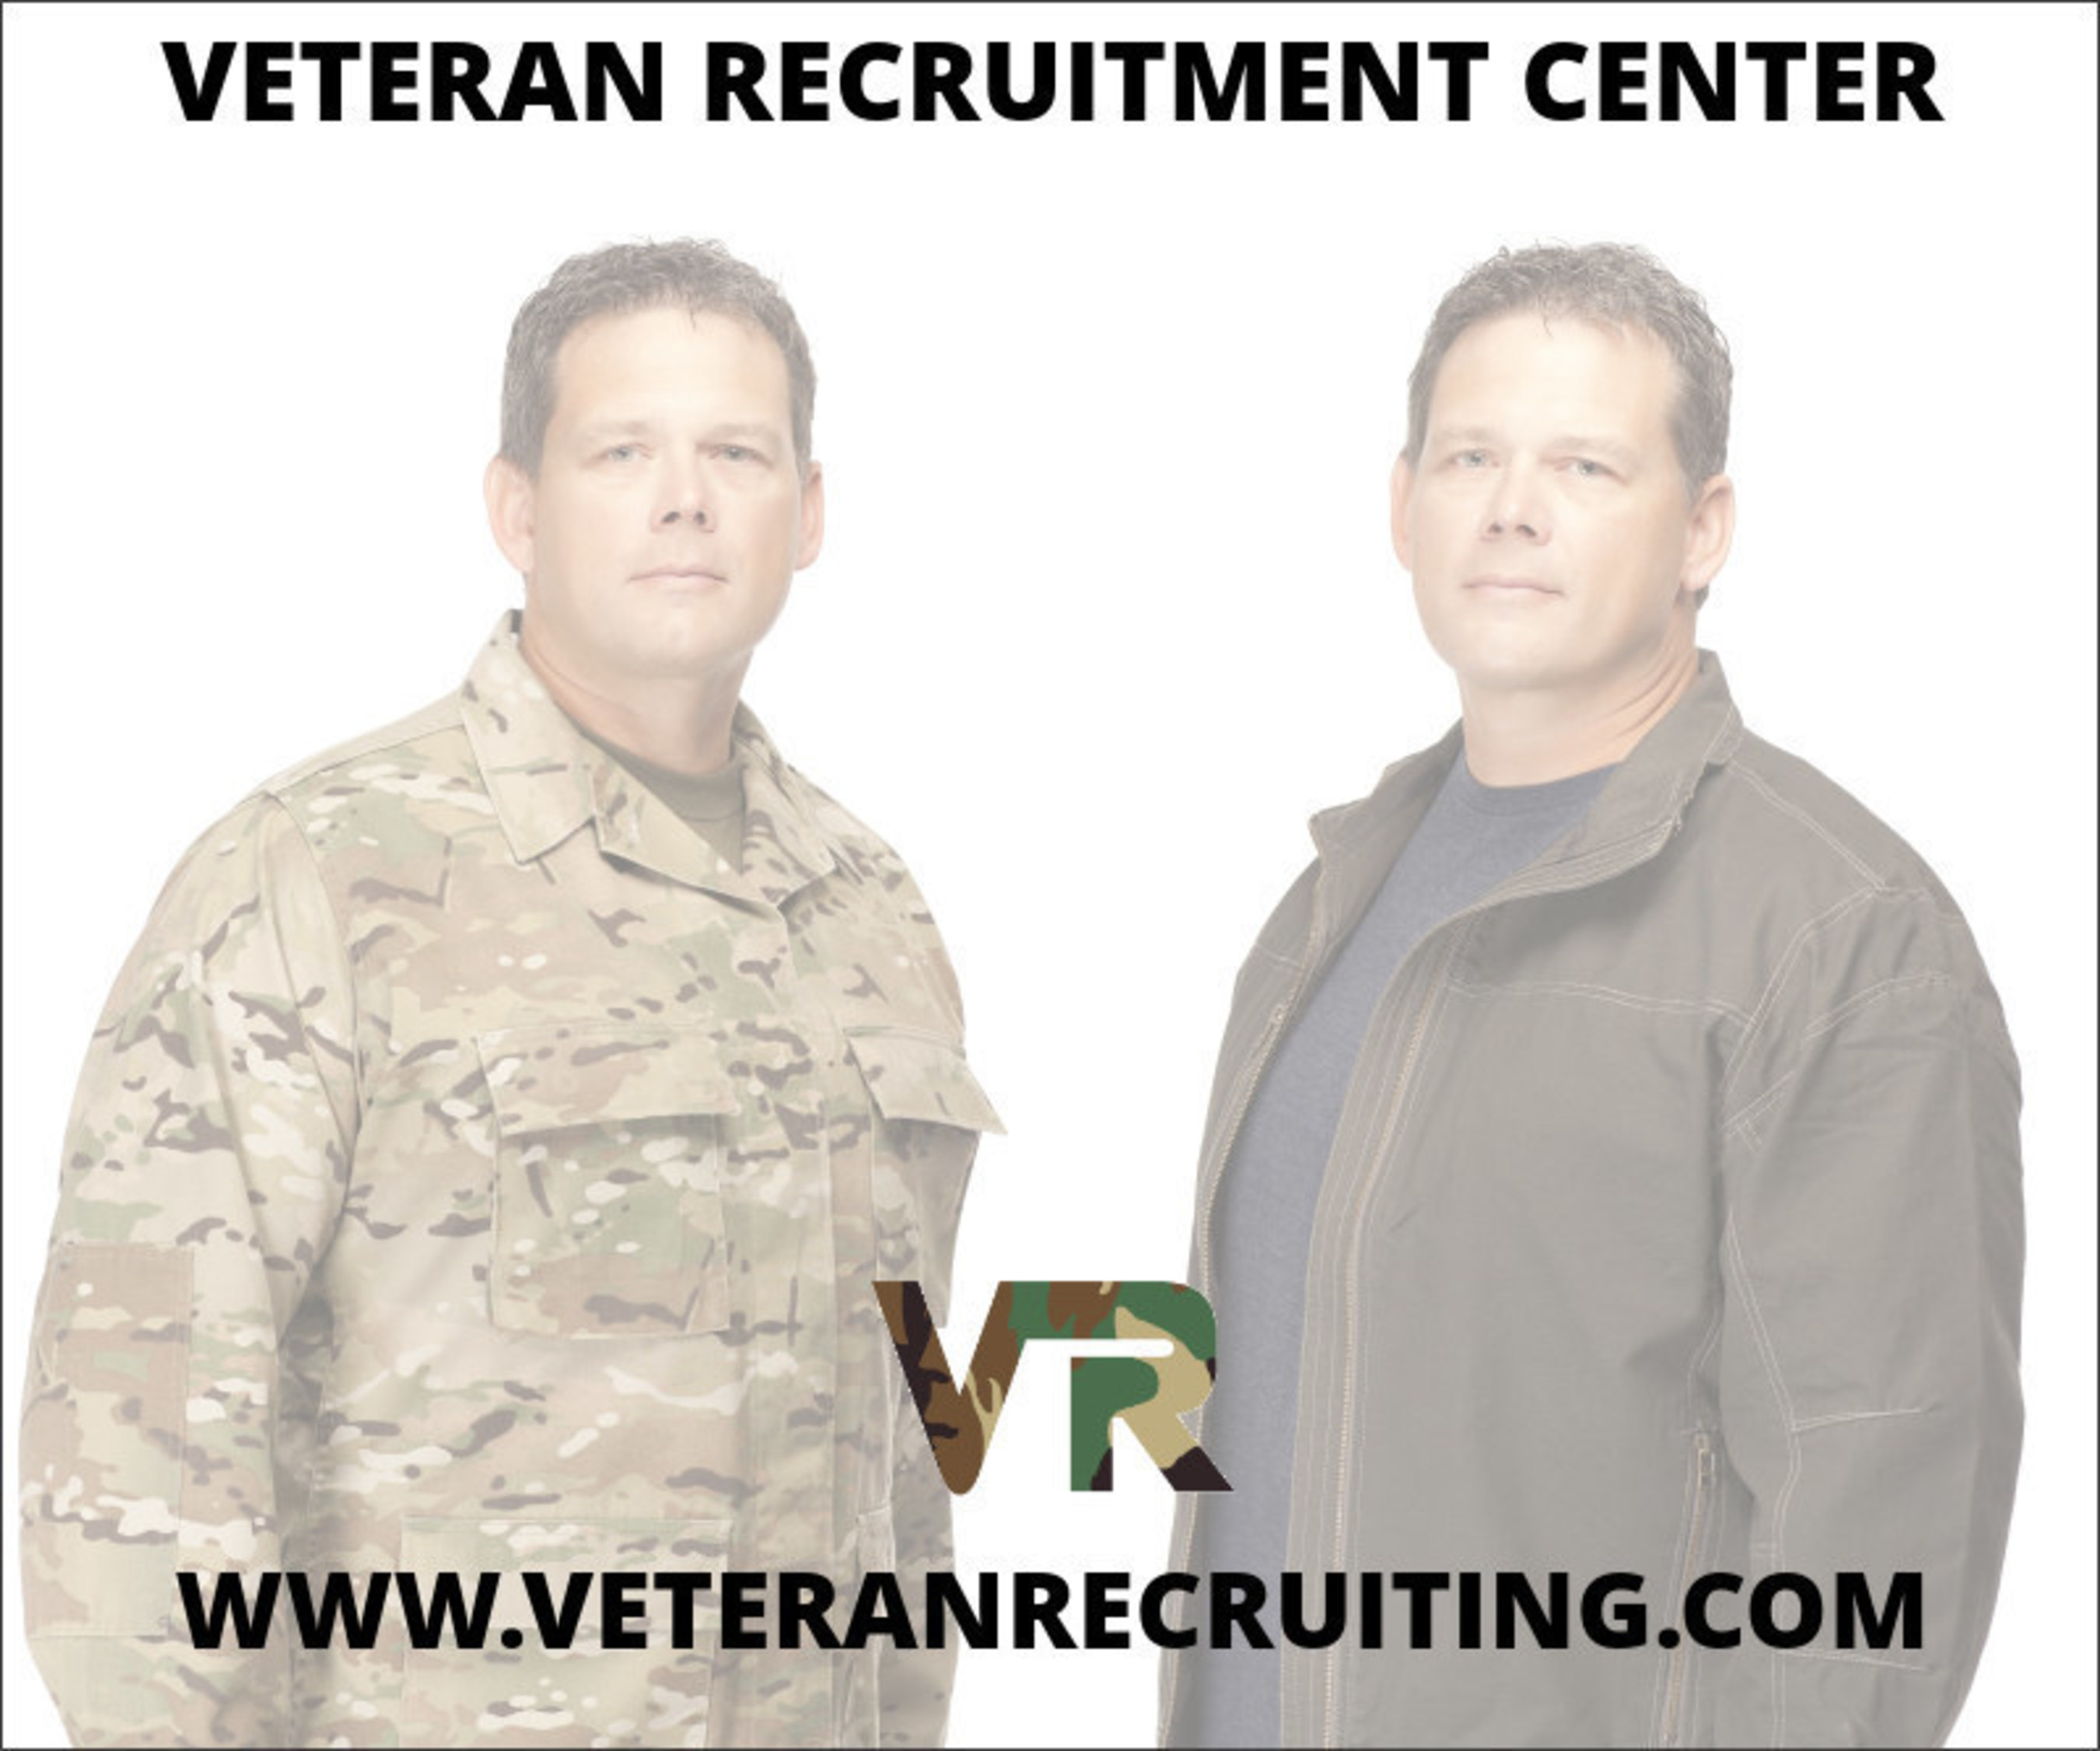 Veteran Recruiting Announces Launch of Veteran Recruitment Center